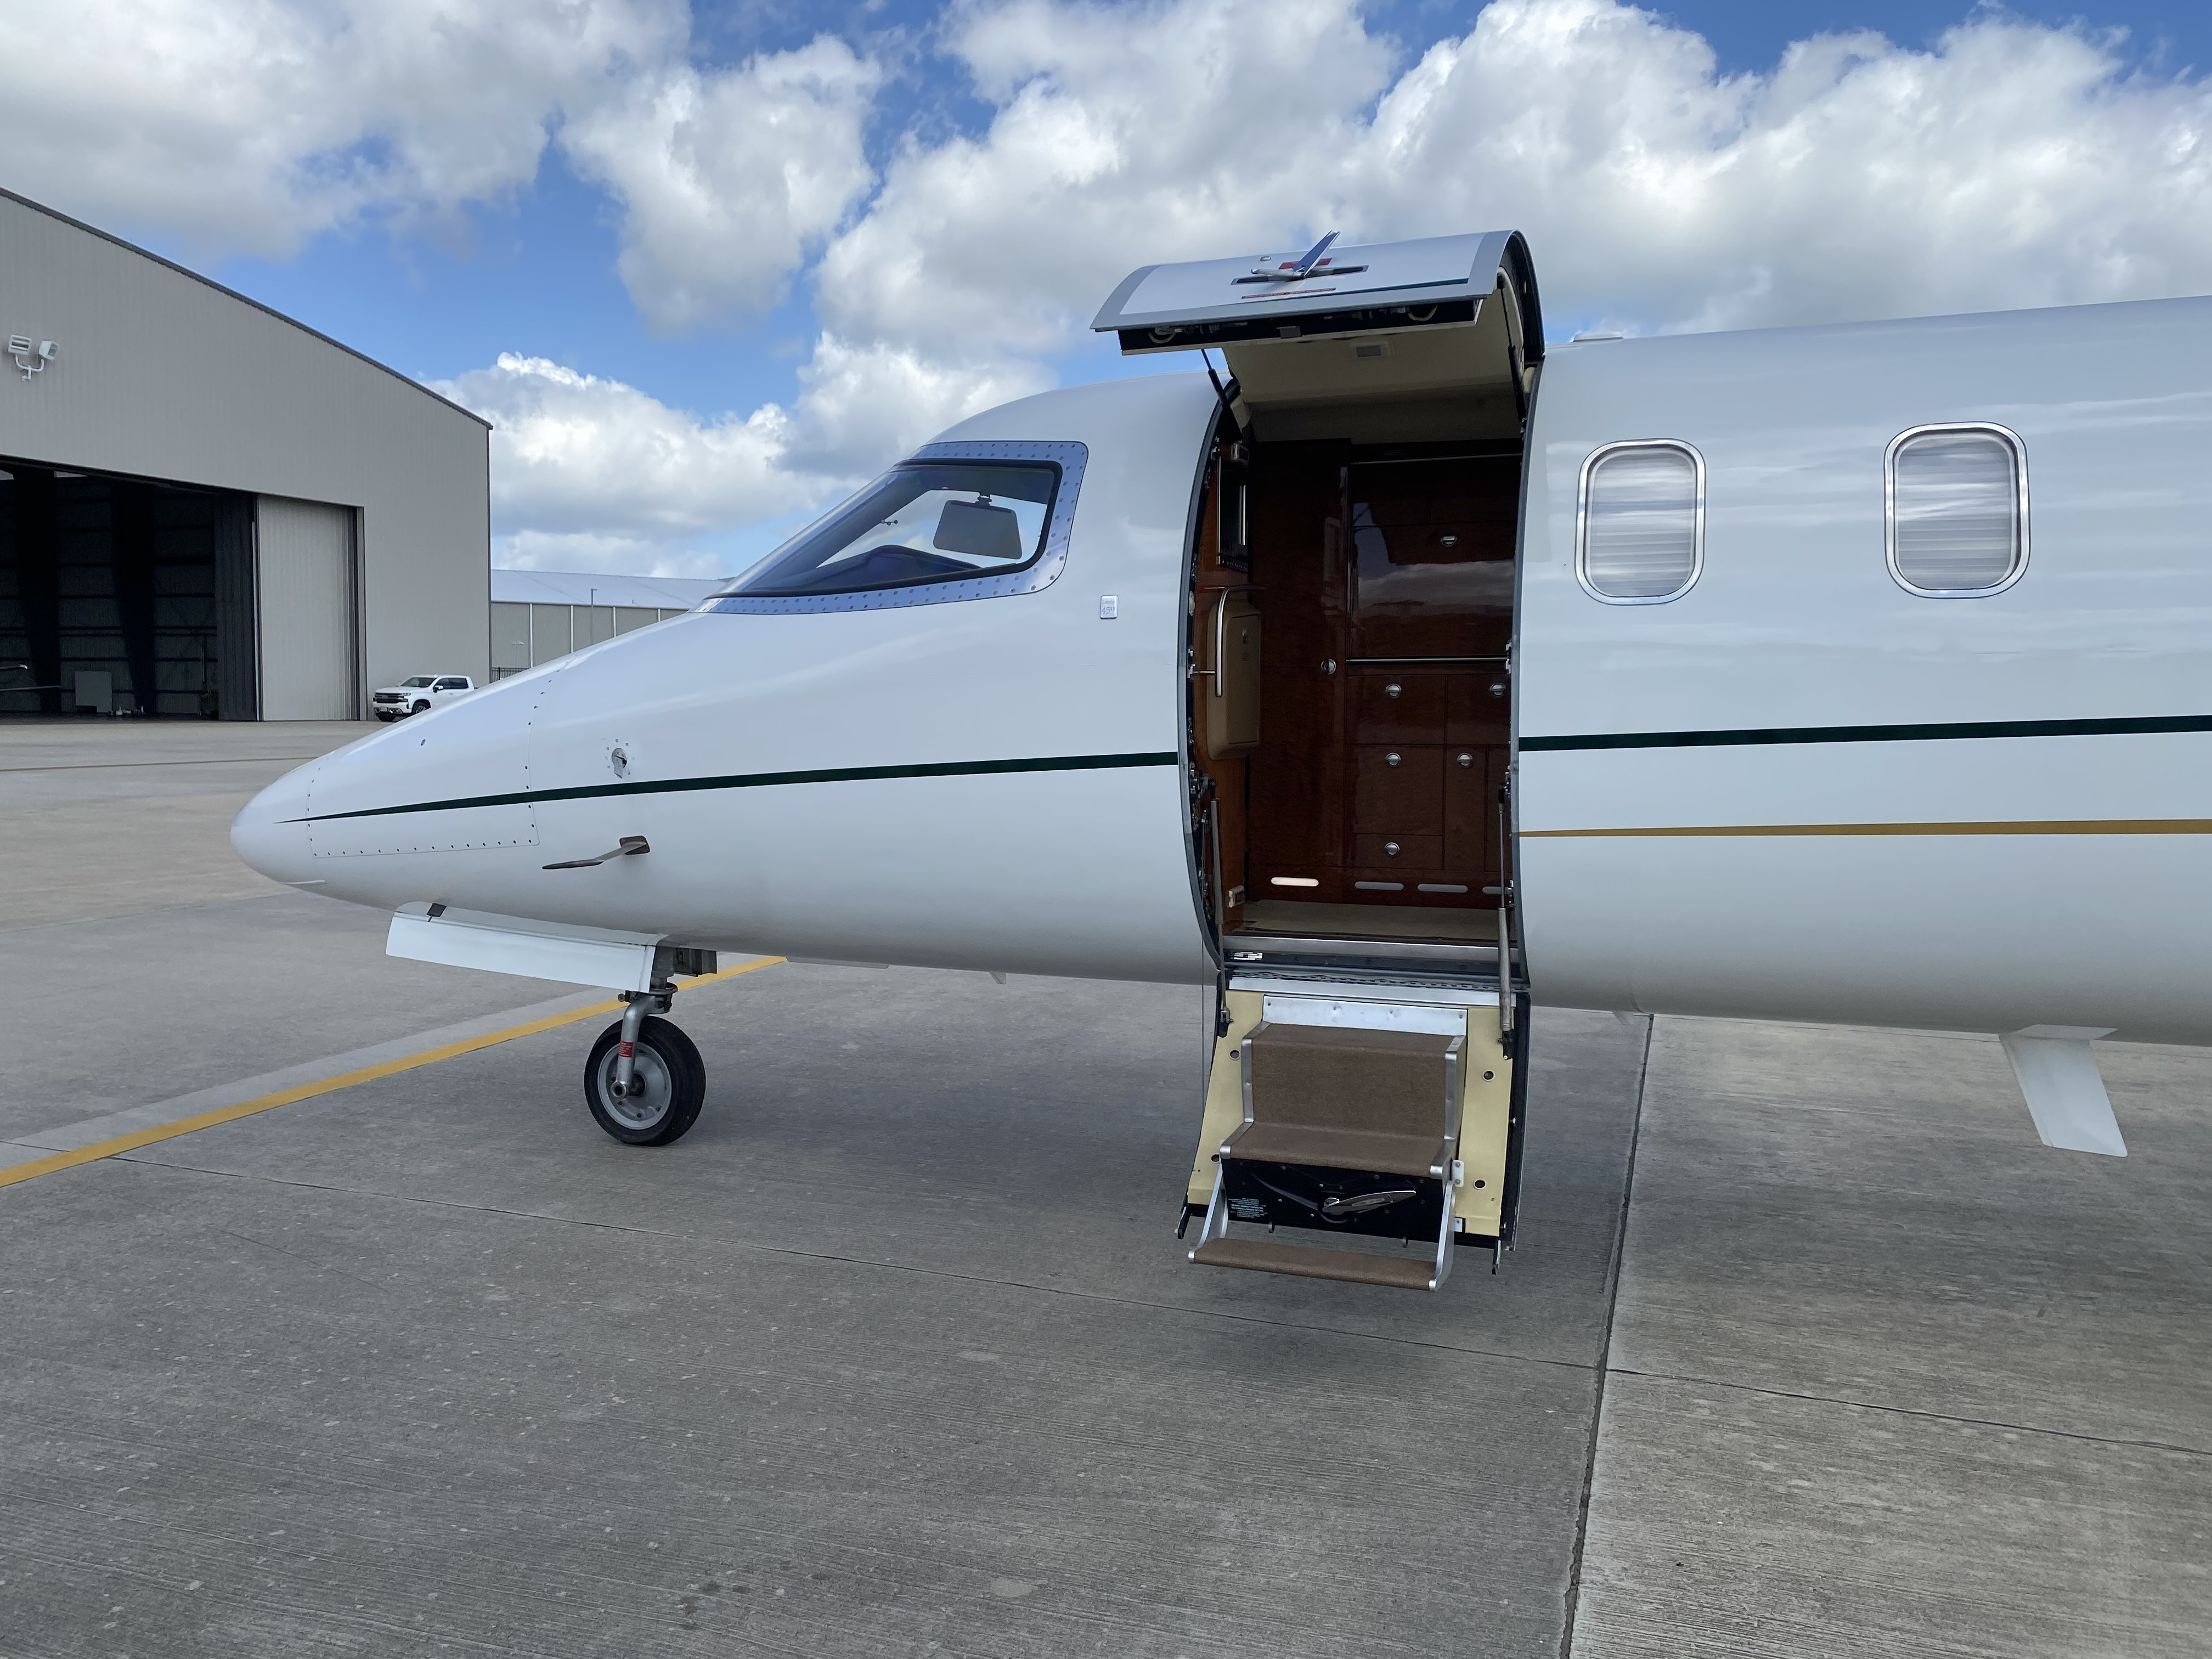 Learjet 45 XR exterior